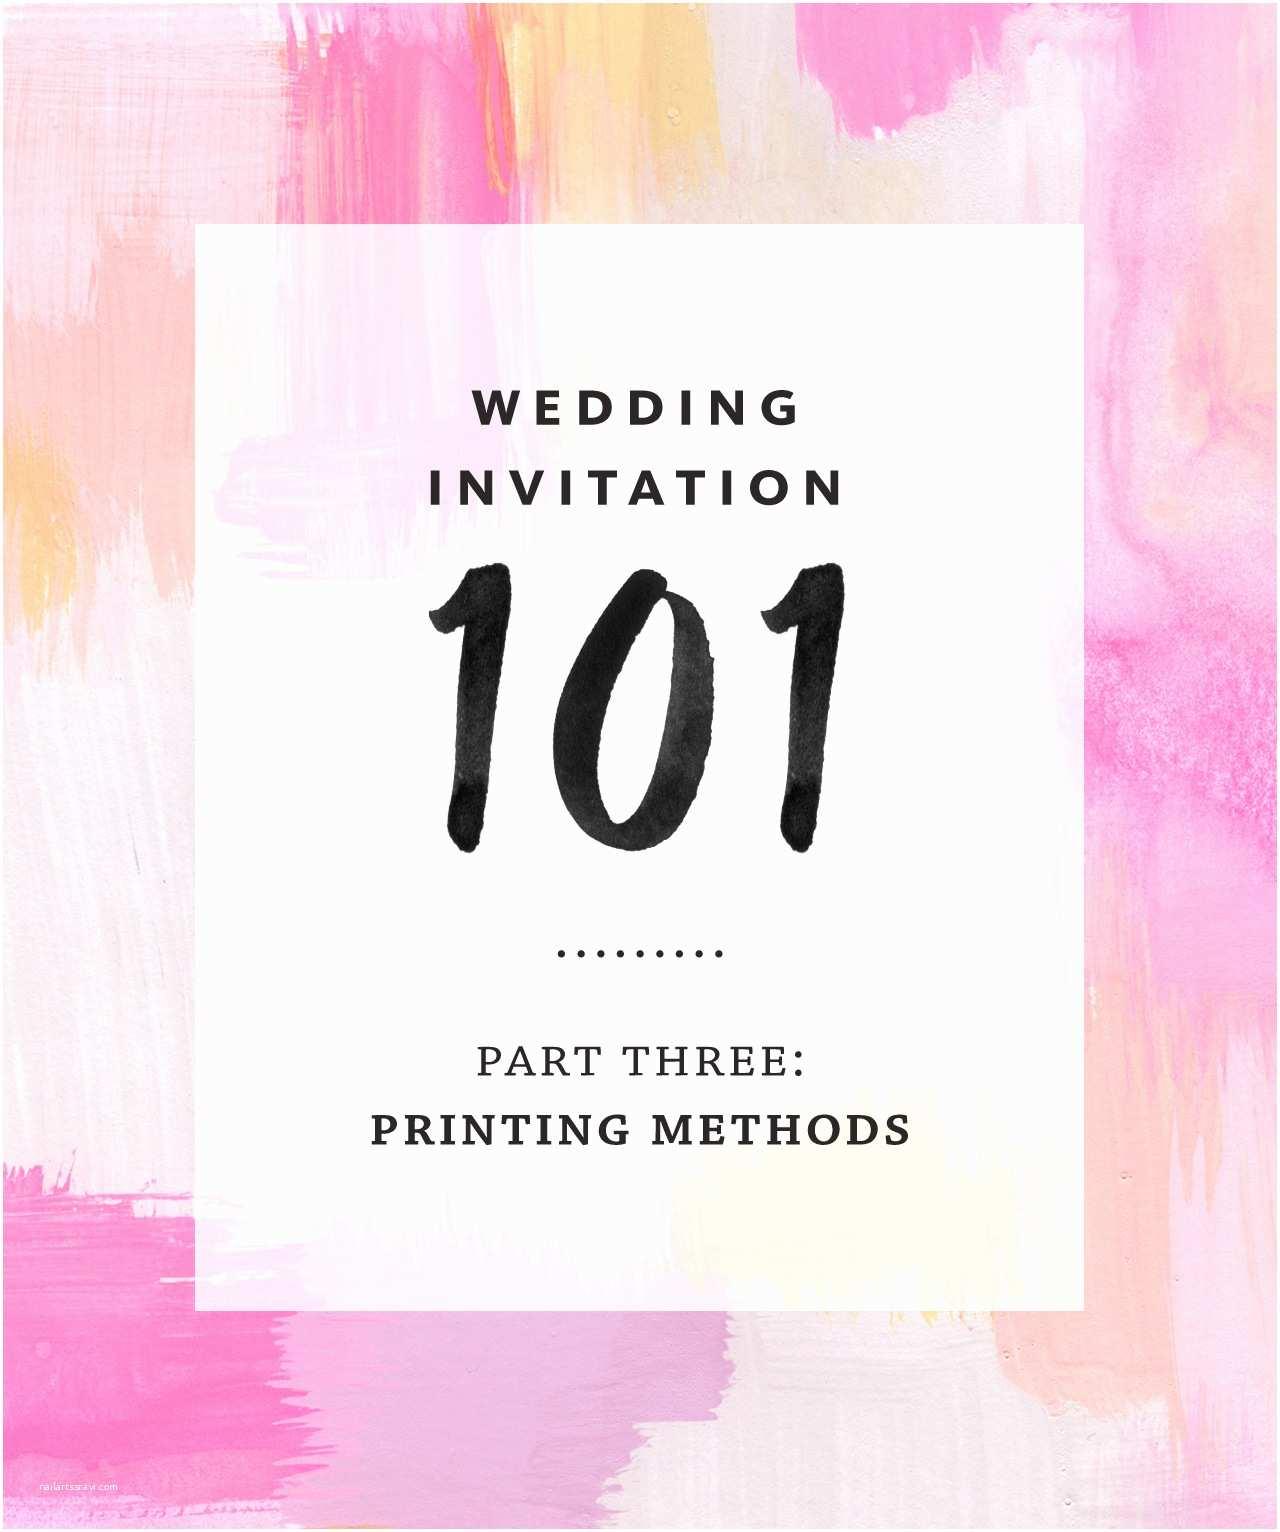 Wedding Invitation Printing Wedding Invitation 101 Part 3 Printing Methods